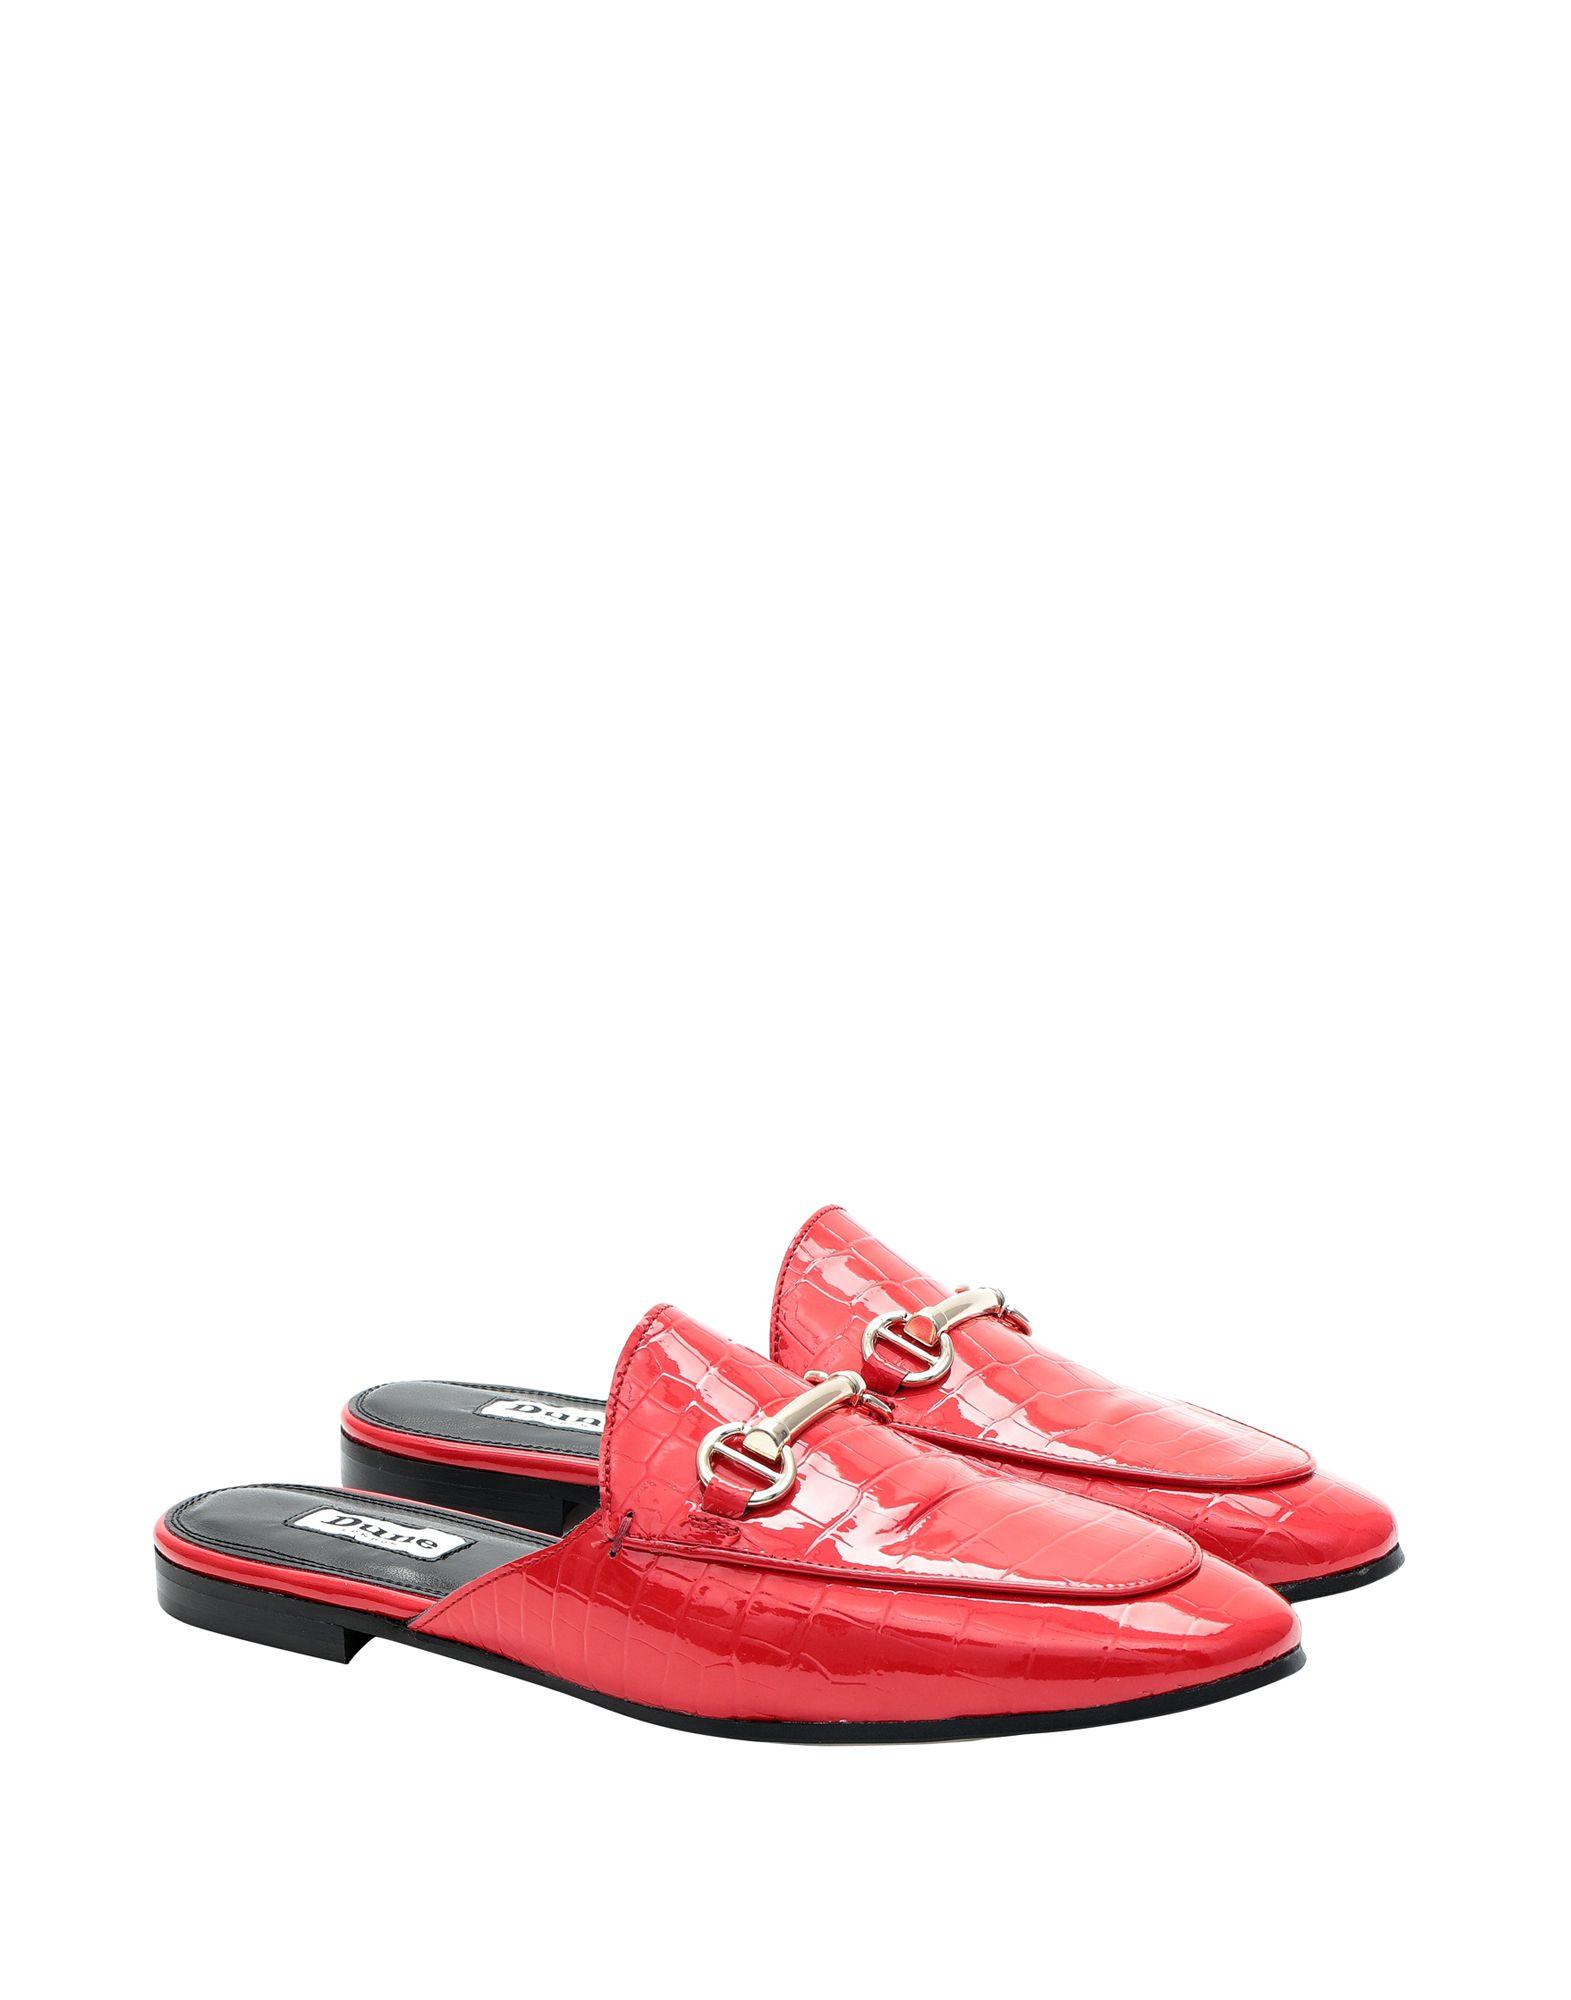 Gut um London billige Schuhe zu tragenDune London um Gene  11533419JE 6d6216